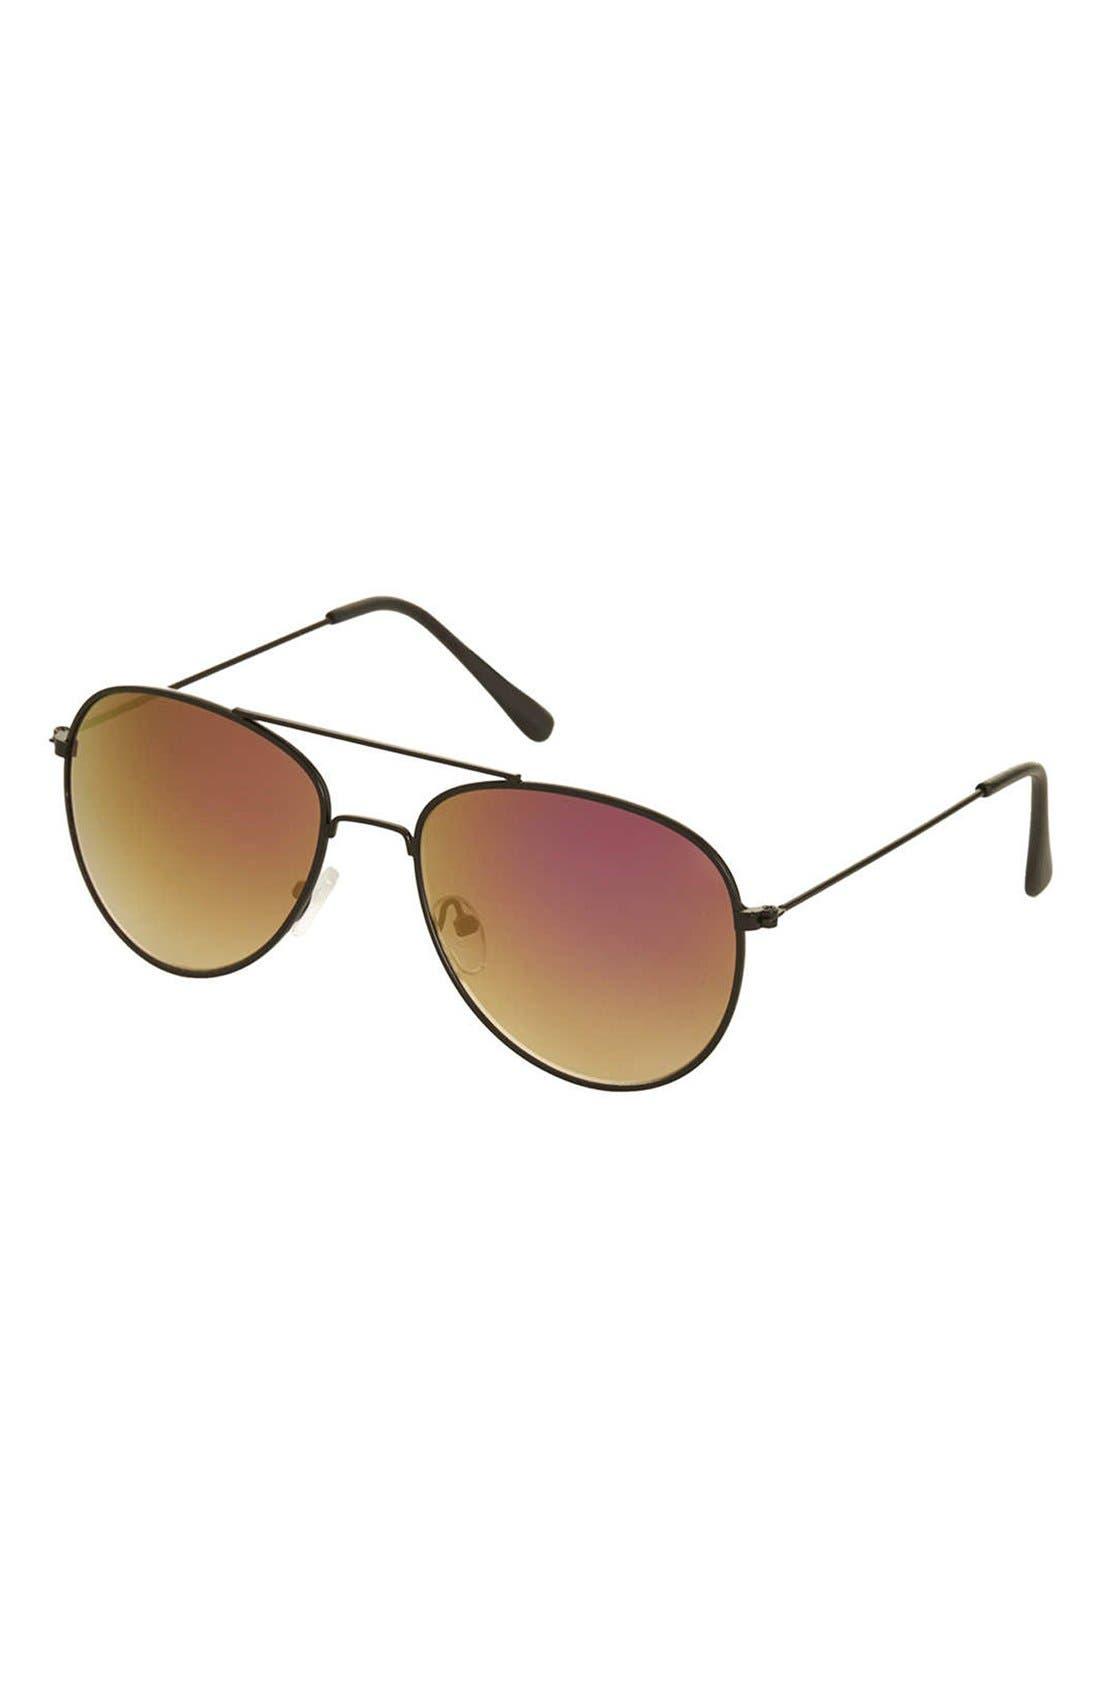 Main Image - Topshop 'Alice' Aviator Sunglasses